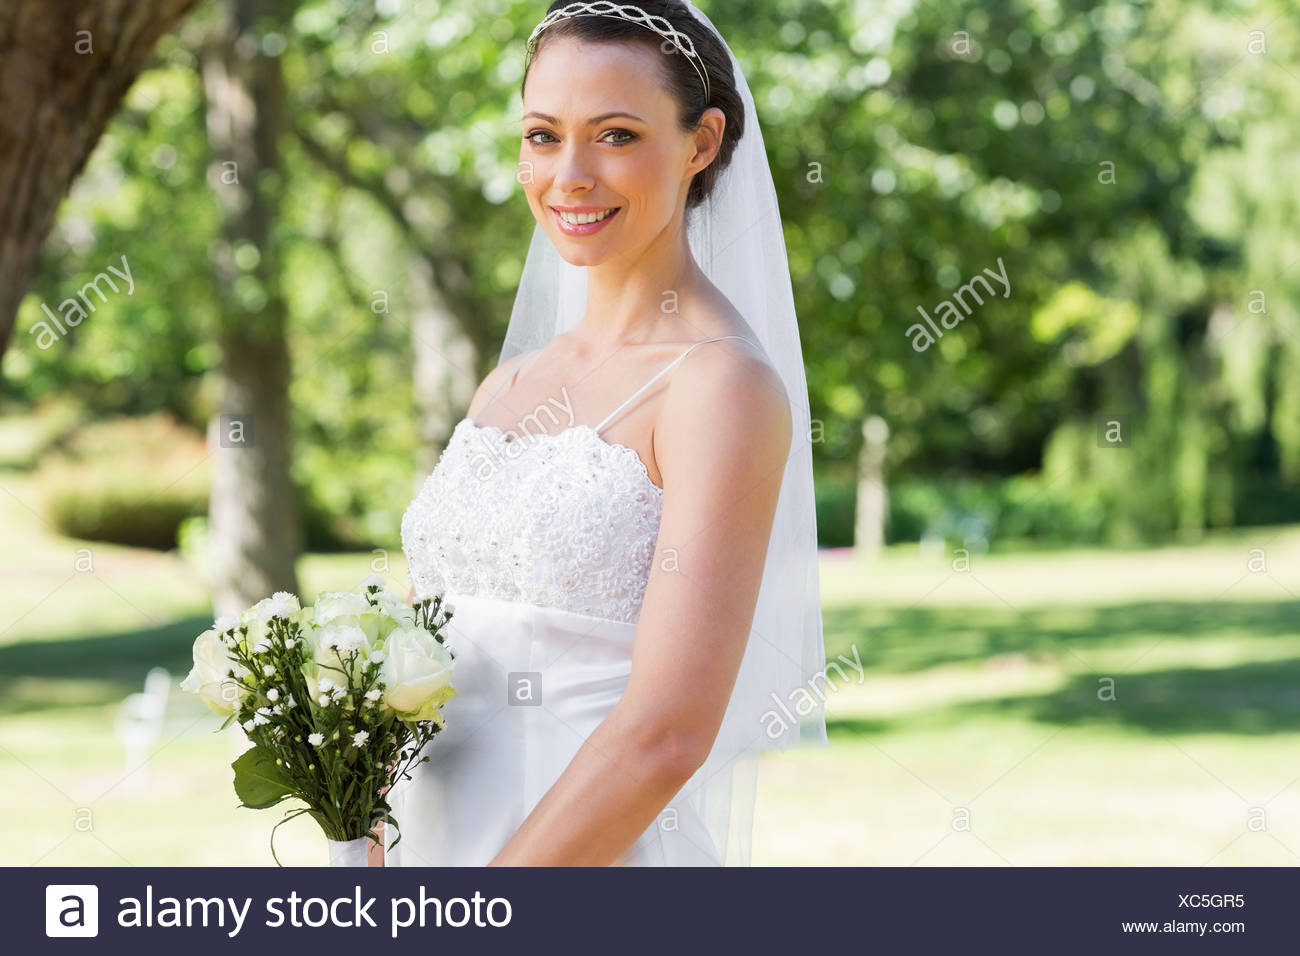 Bride with flower bouquet in garden - Stock Image